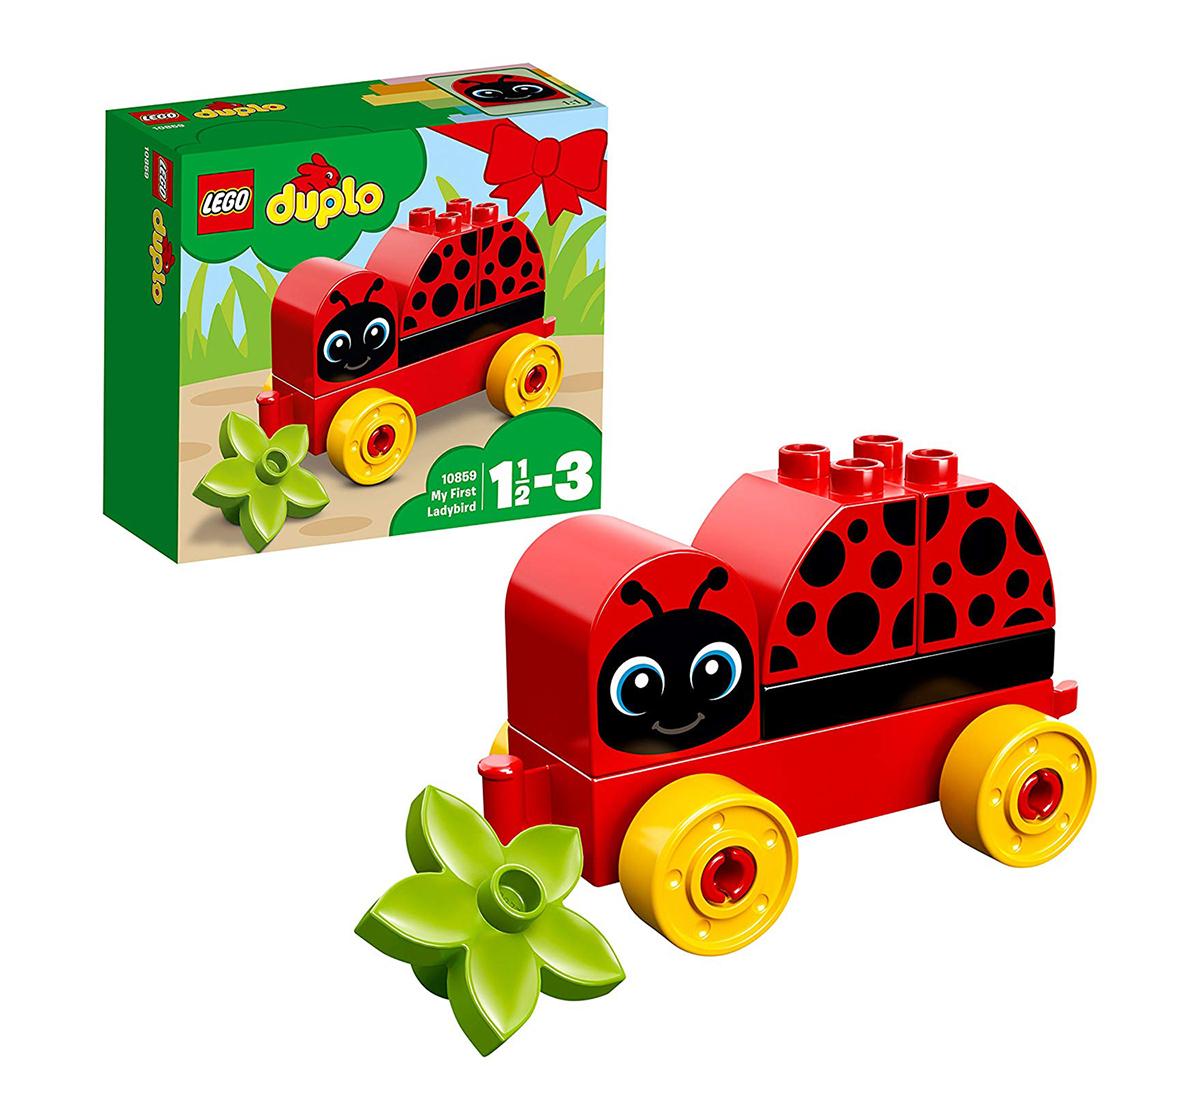 LEGO | Lego Duplo My First Ladybug Building  (6 Pcs) 10859  Blocks for Kids age 1½Y+